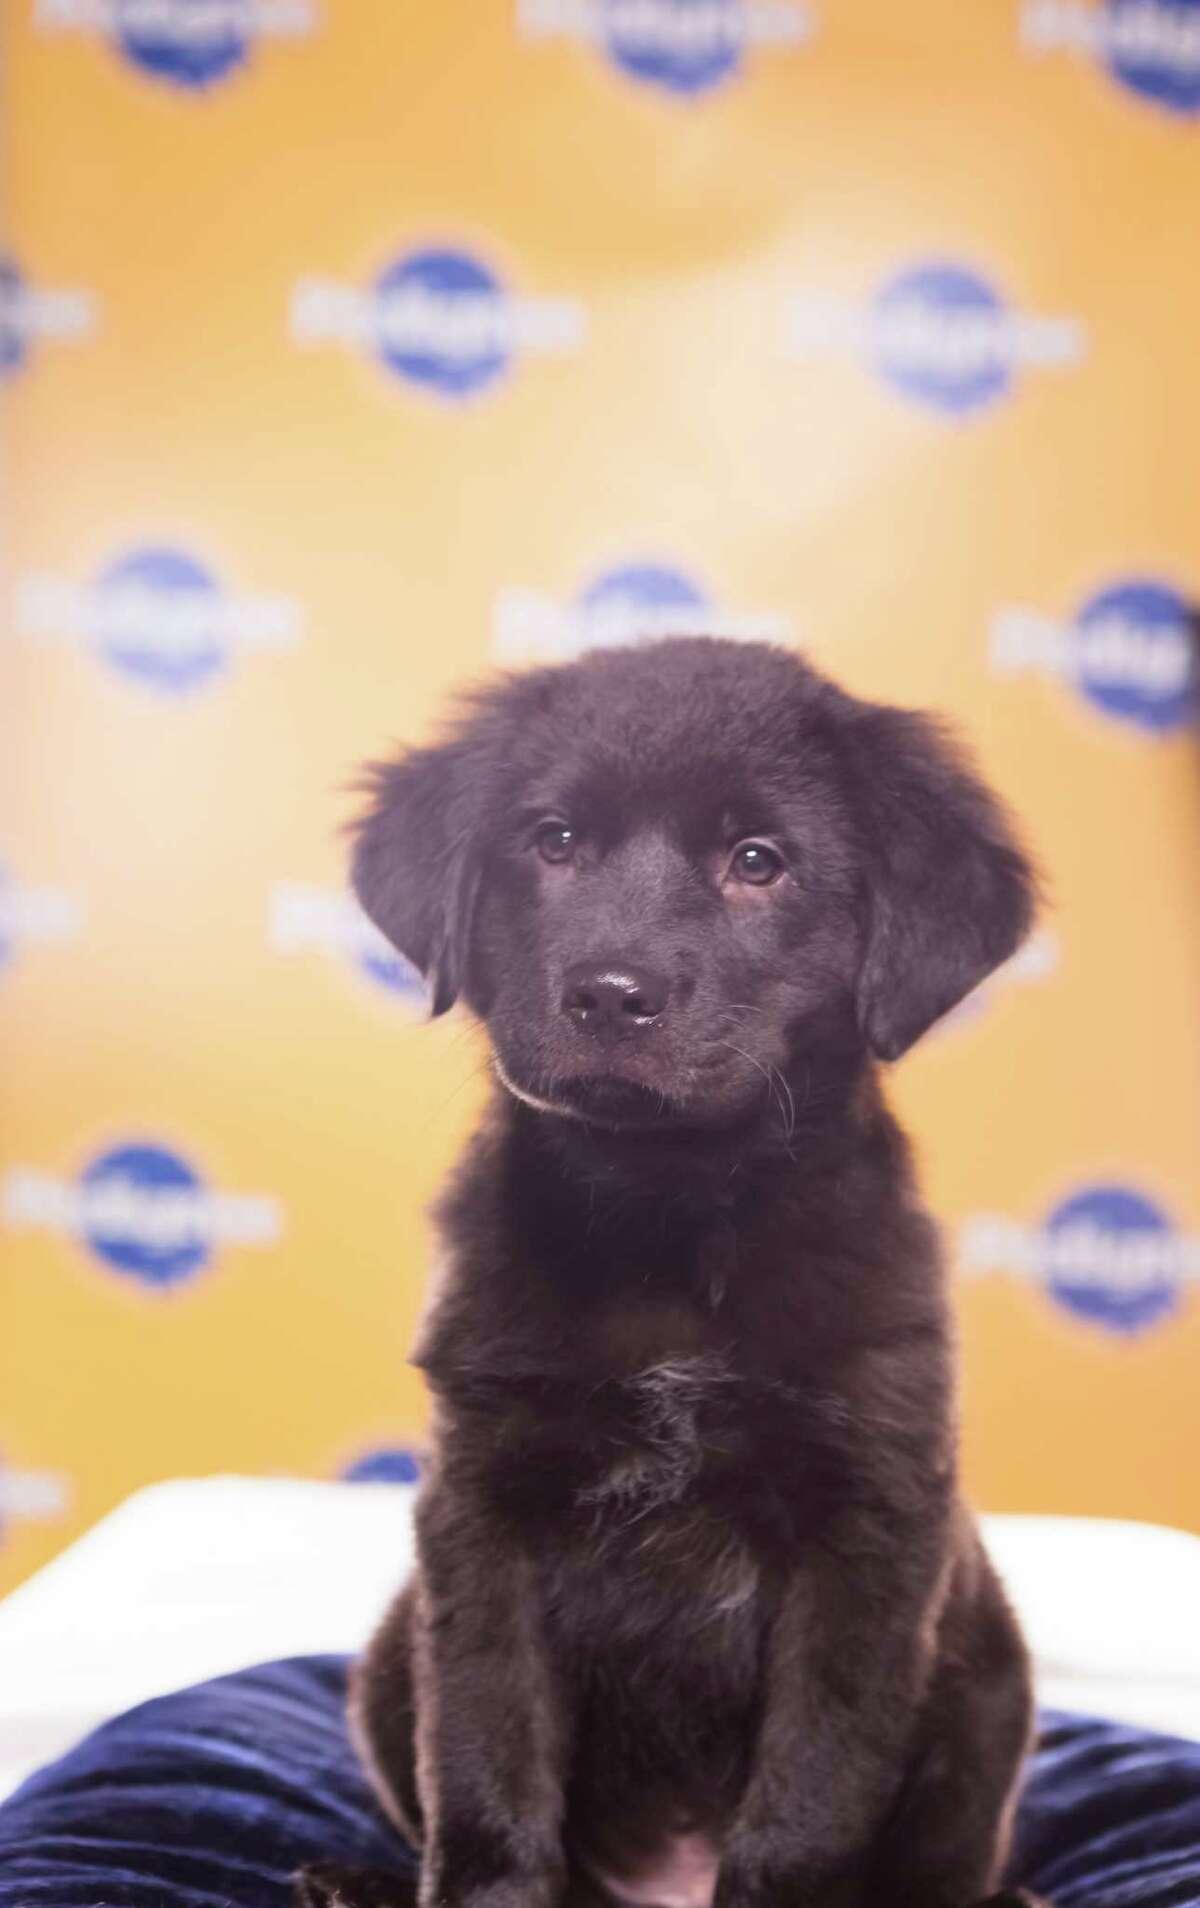 Name: ShadowBreed(s): Catahoula/Labrador Retriever mix Sex: Male Age: 9 weeks Fun Fact: He is a really soft super snuggler Adoption Organization: Bonnie Blue Rescue